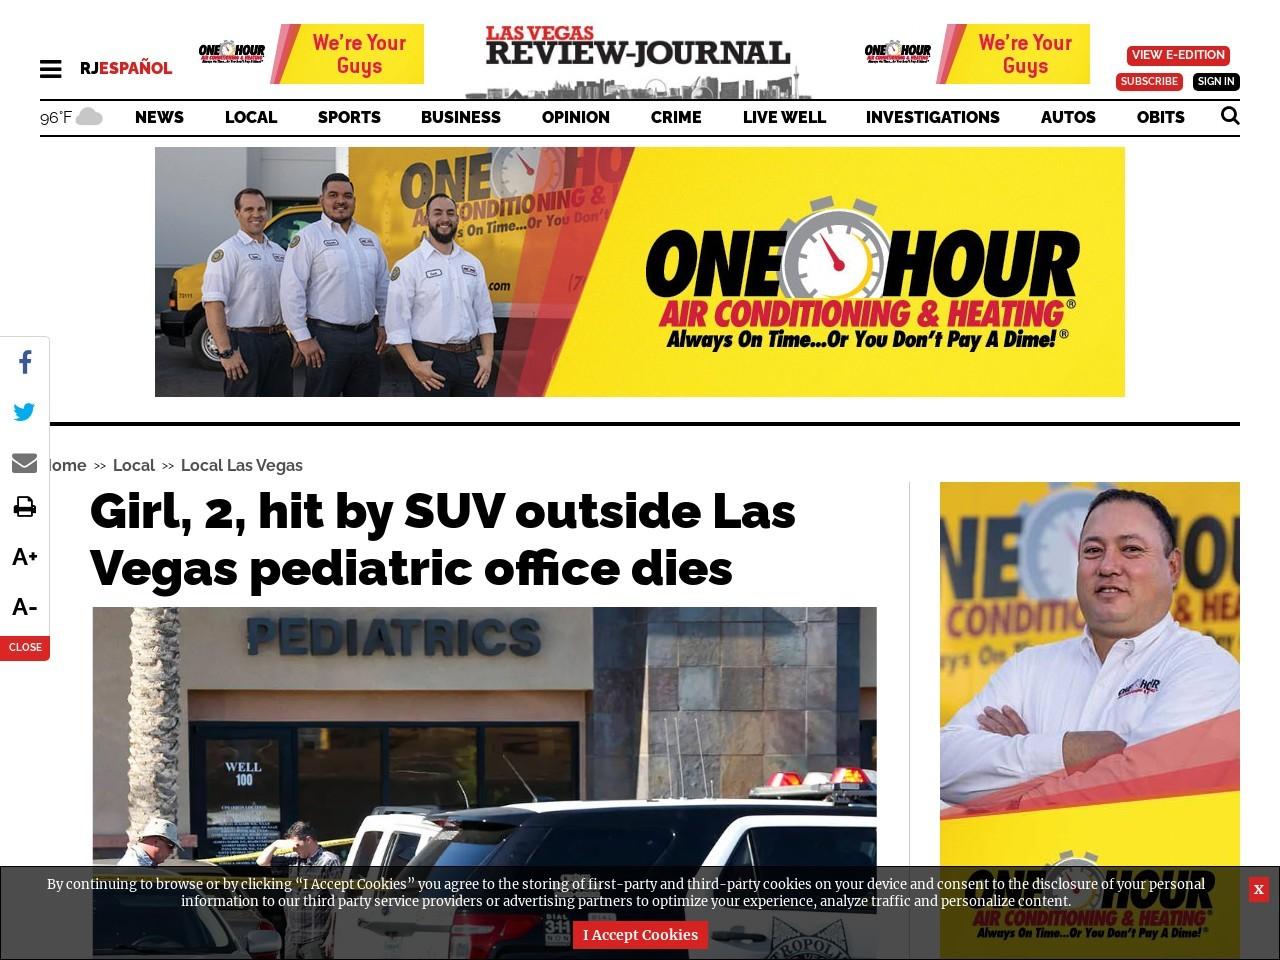 Girl, 2, hit by SUV outside Las Vegas pediatric office dies